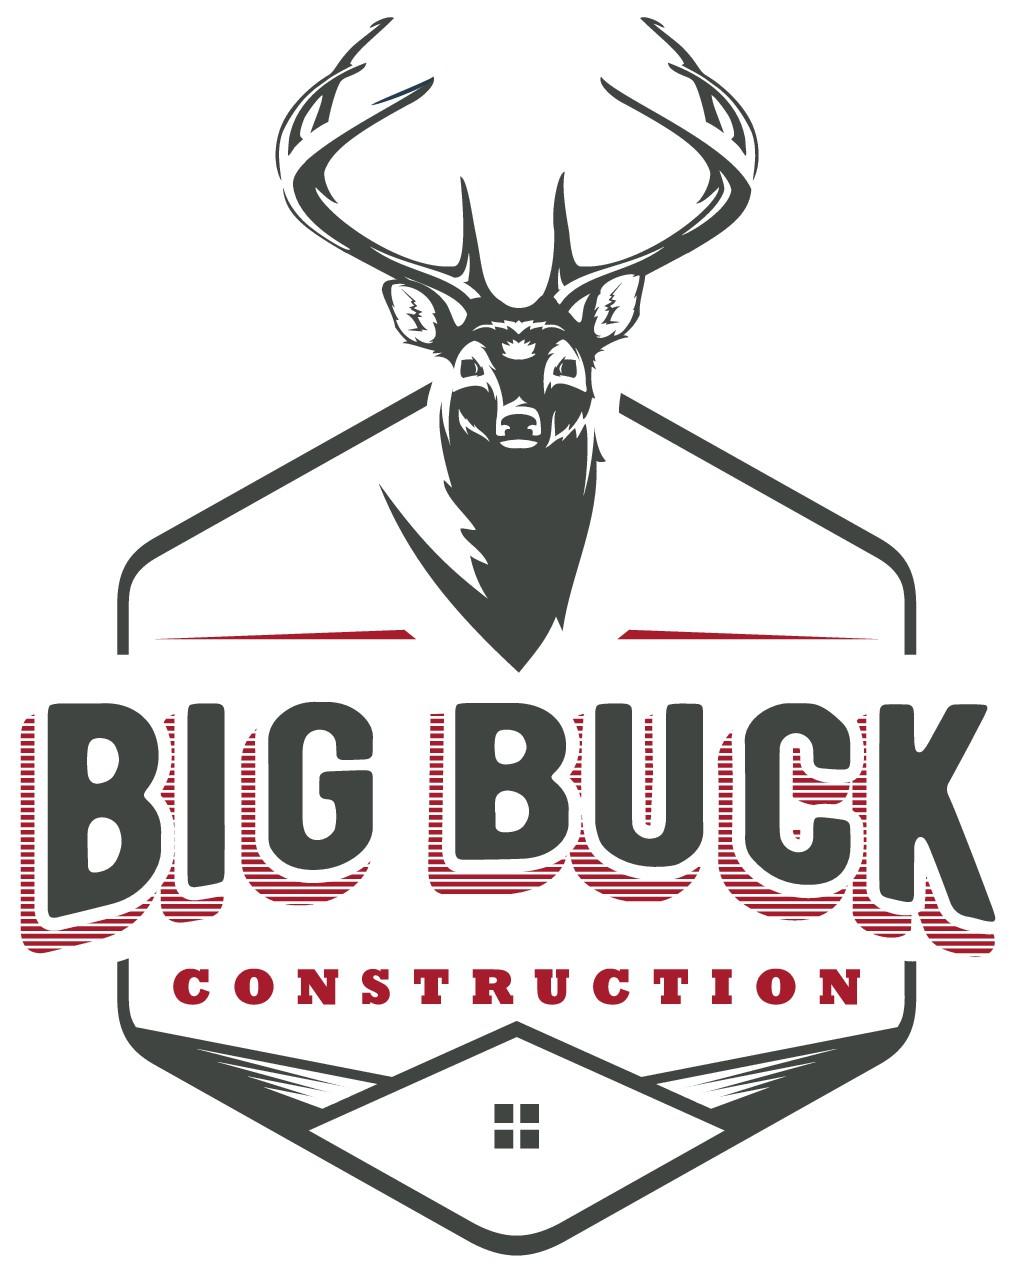 Design classic construction logo!